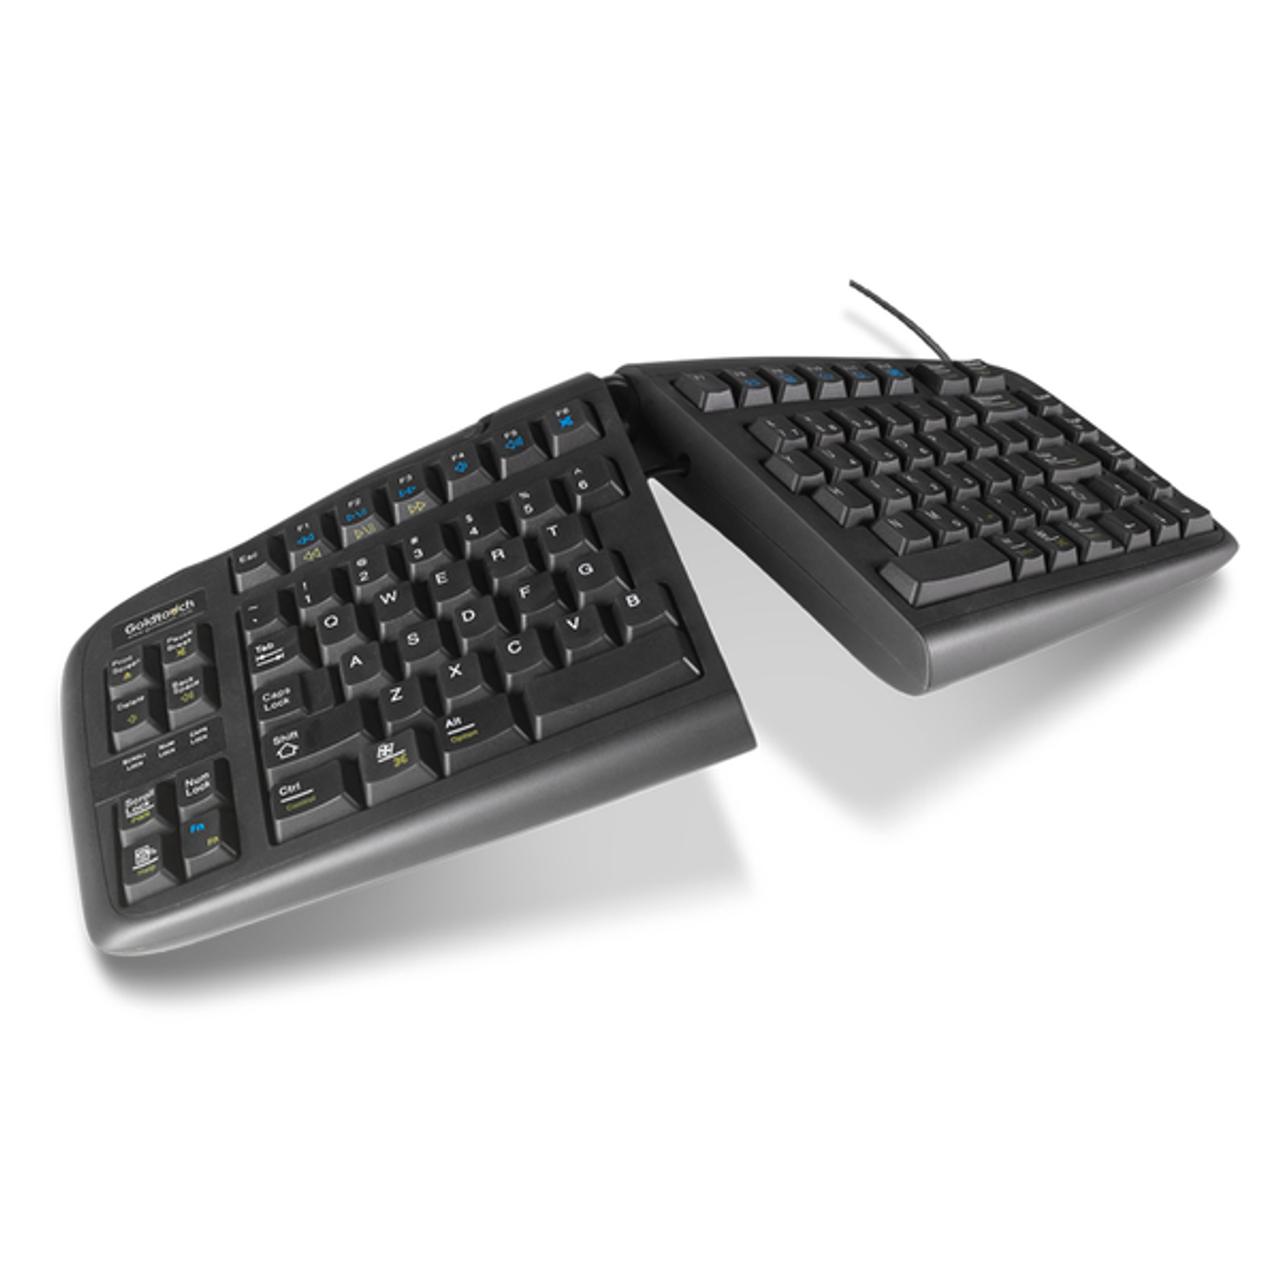 Insignia Usb Keyboard /& Mouse Combo